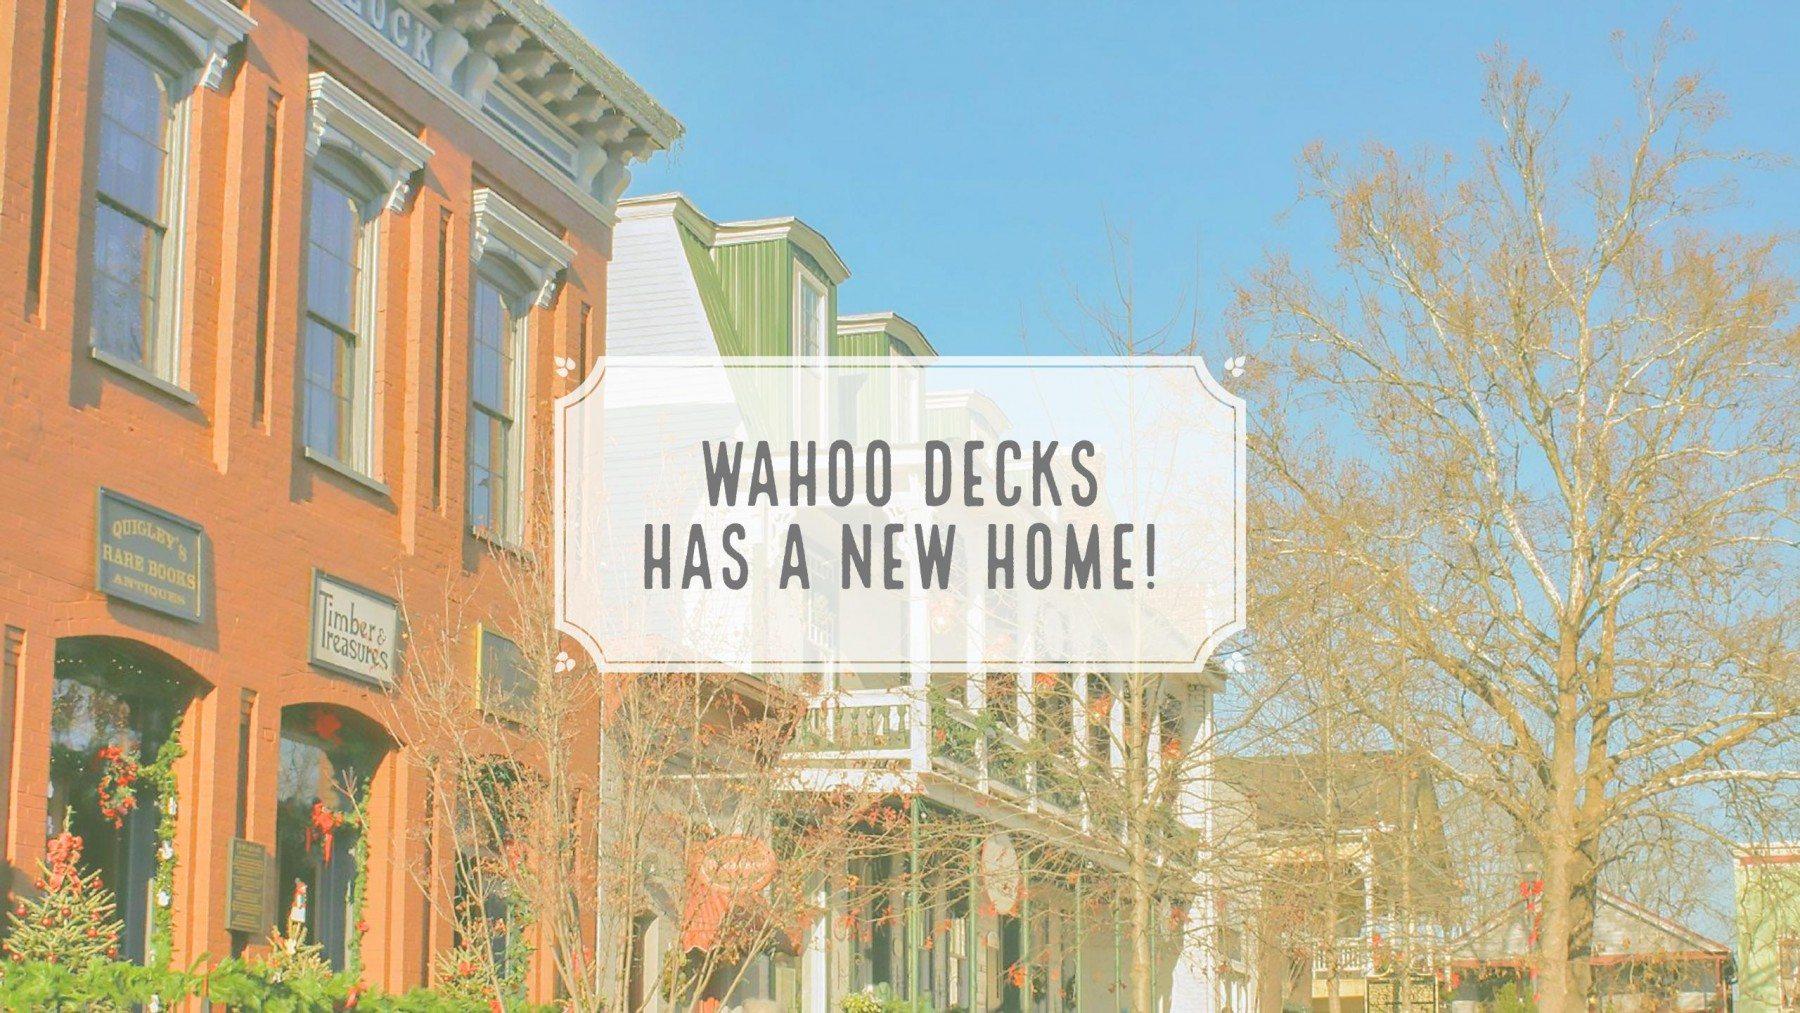 Wahoo Aluminum Deck Manufacturer Moves to Dahlonega